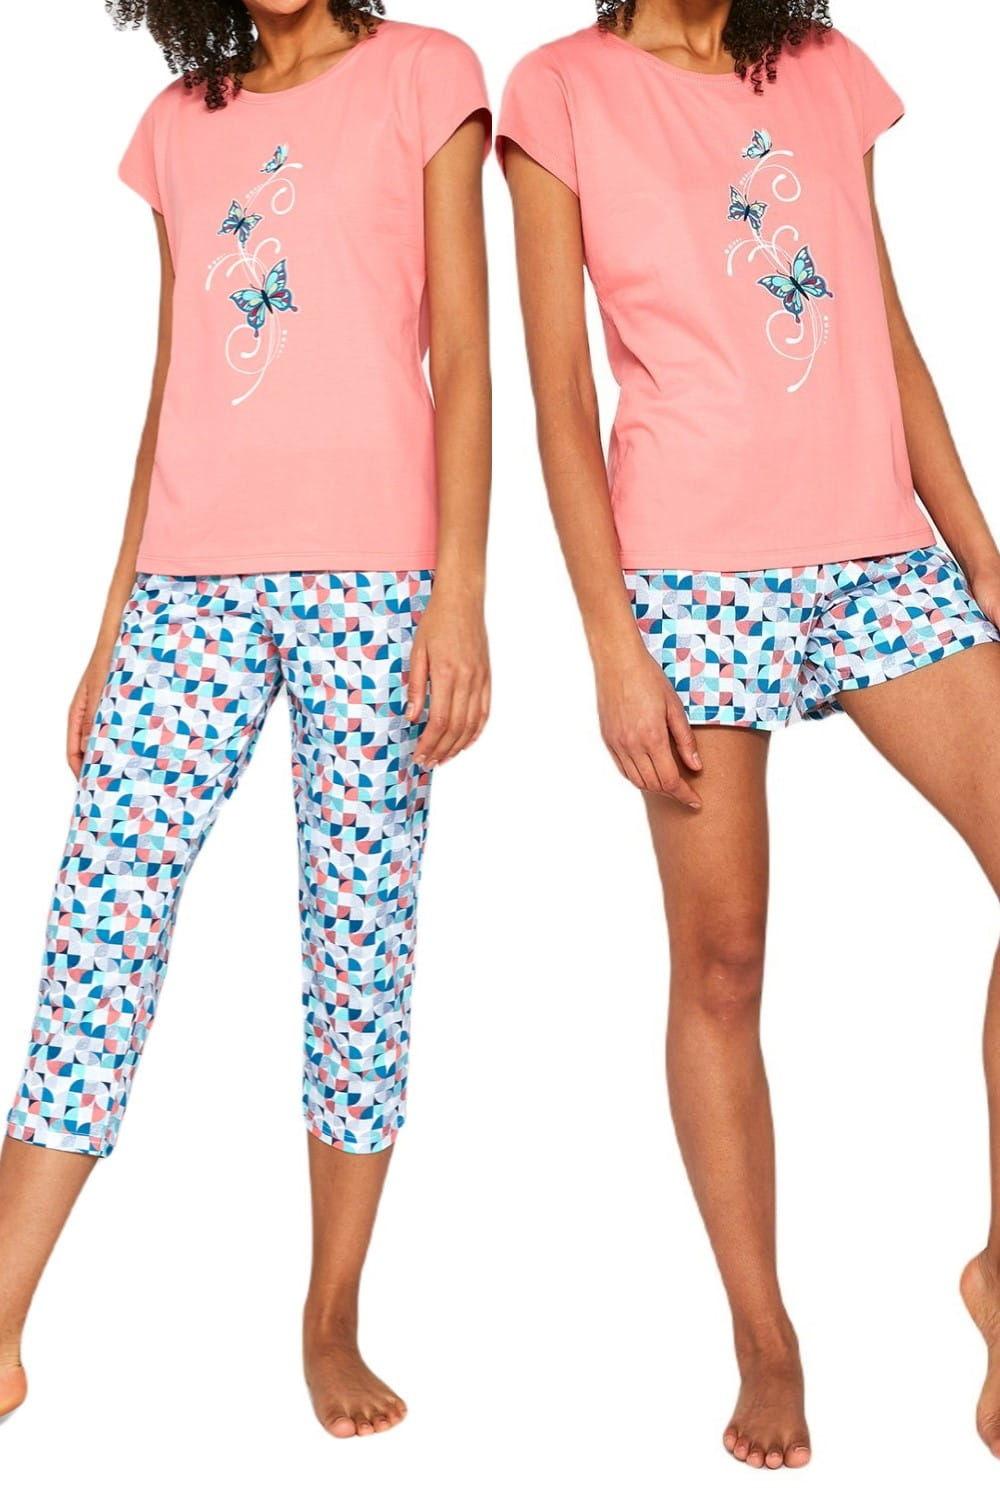 Bawełnian piżama damska Cornette 3 częściowa 665/202 Tree butterflies morelowa